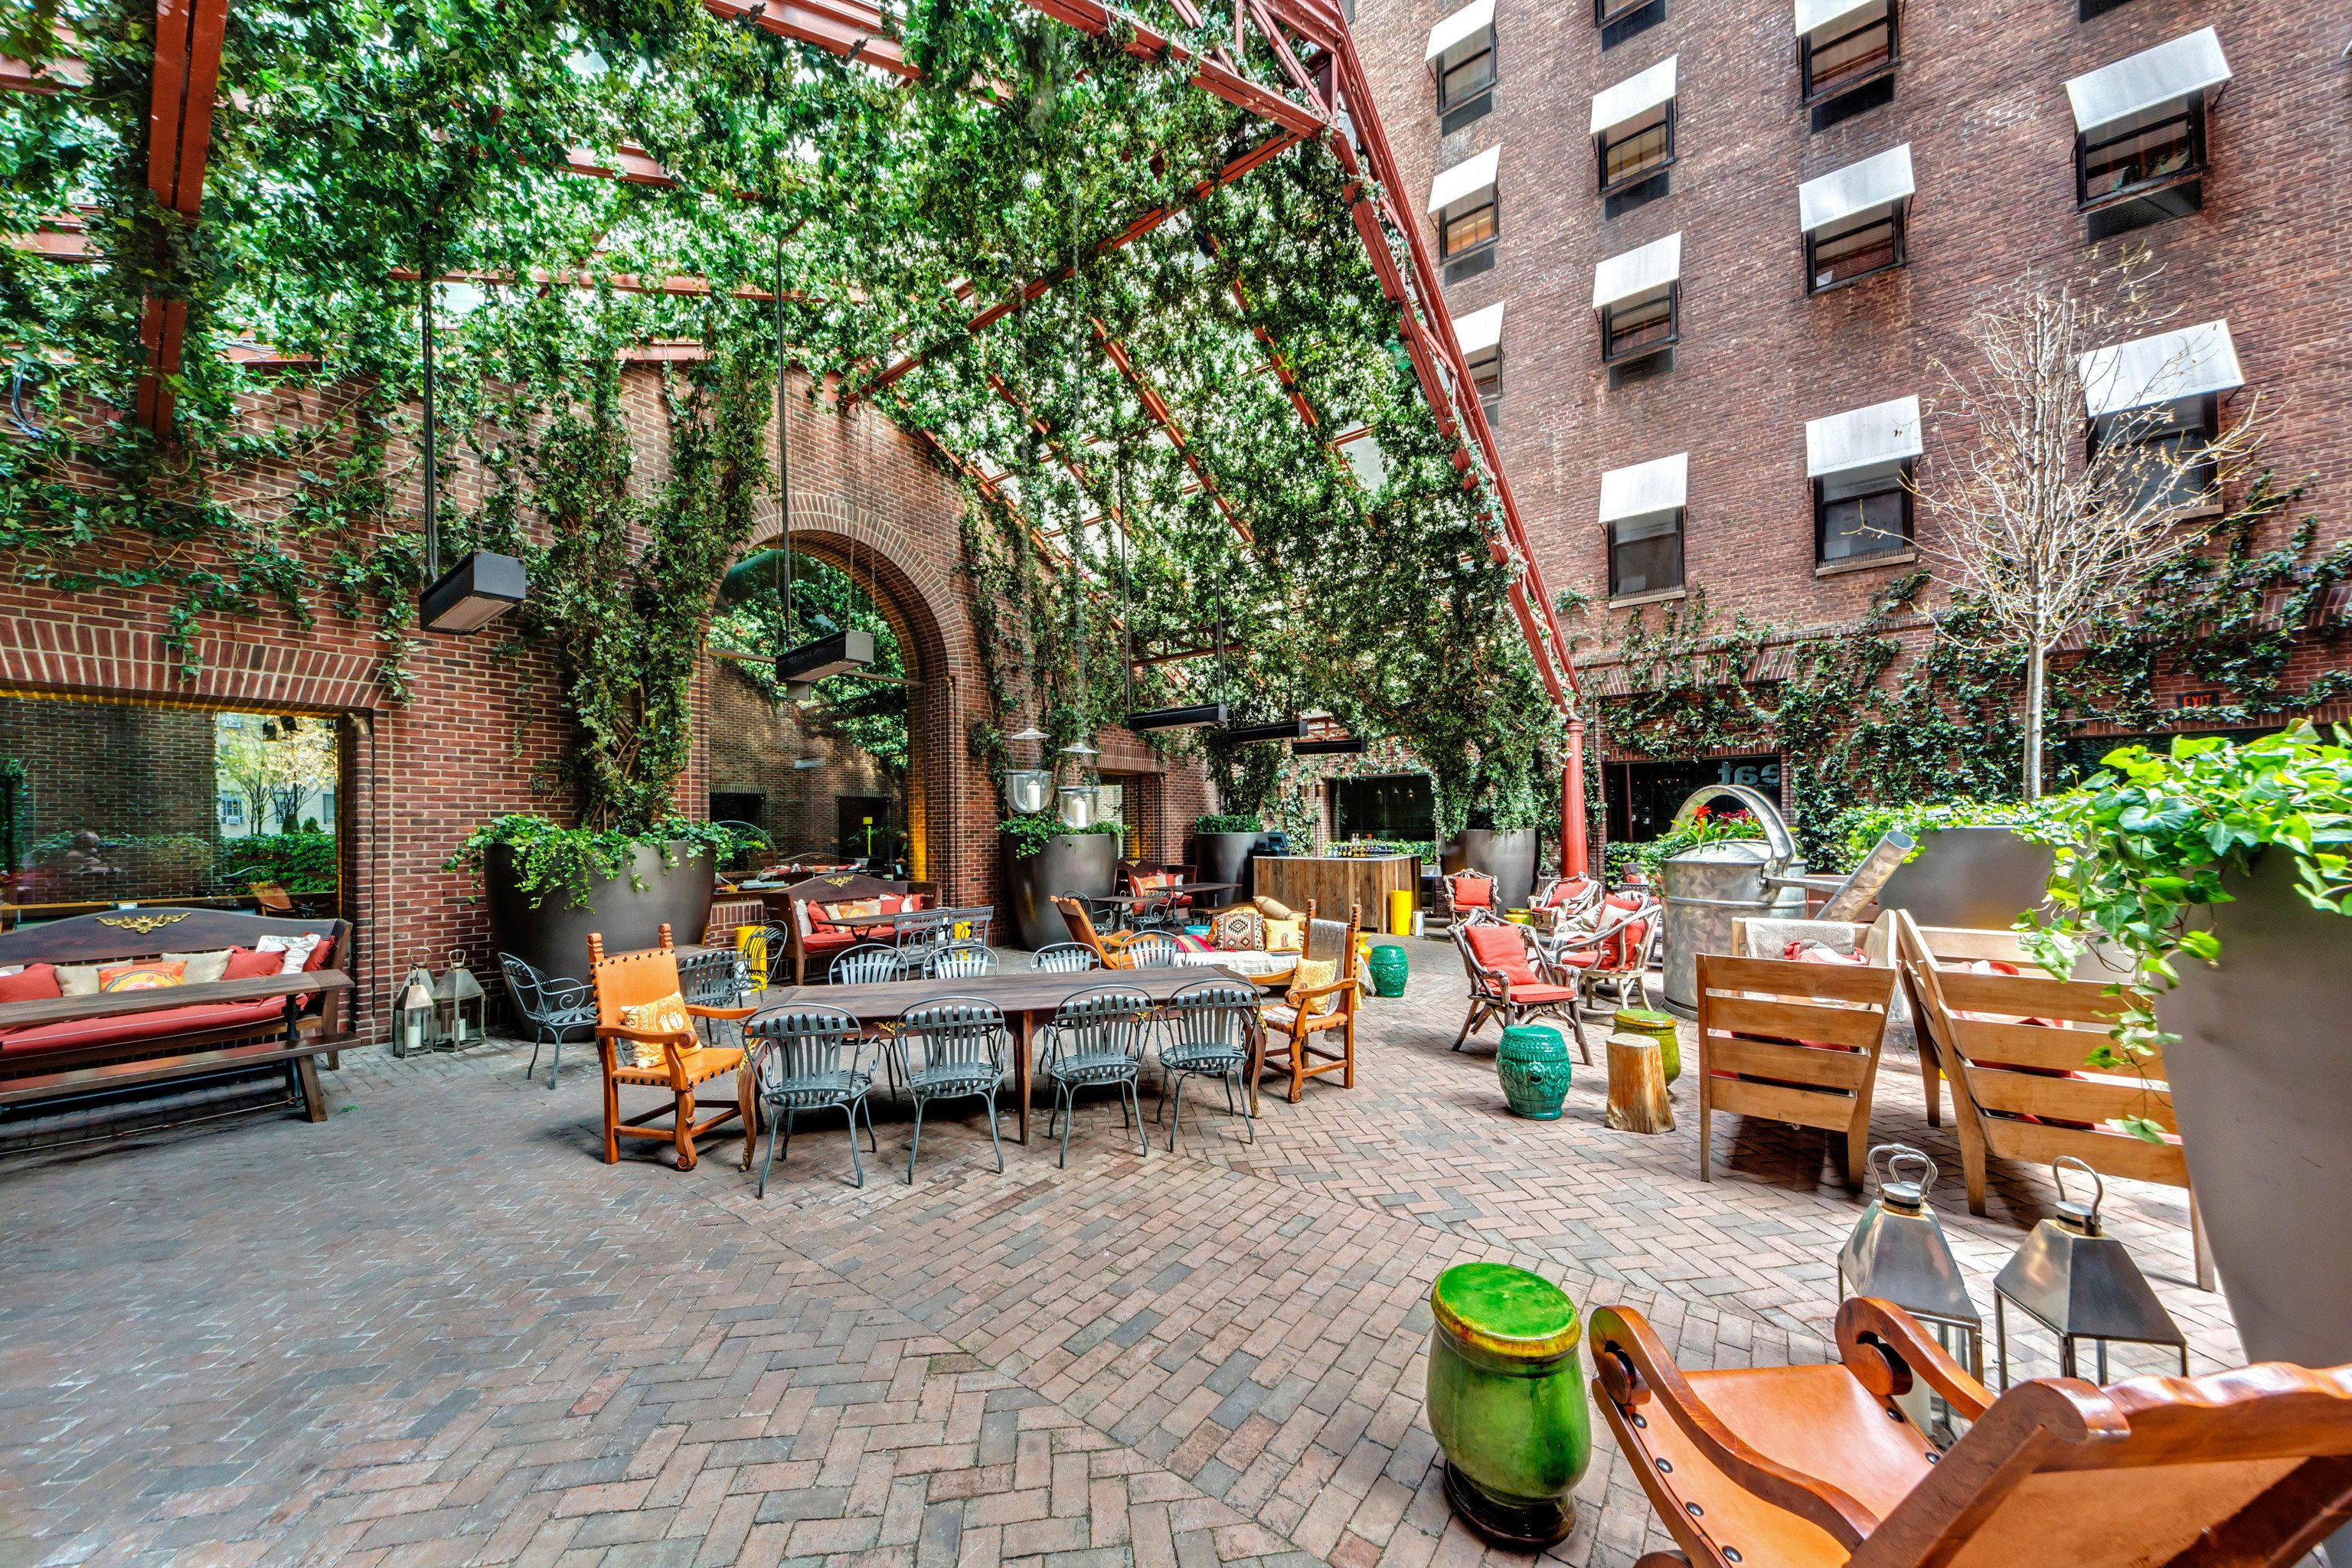 Budget City Dining Drink Eat Hotels Modern Outdoors Travel Tips Trip Ideas outdoor Courtyard Resort backyard estate yard outdoor structure plaza restaurant Garden